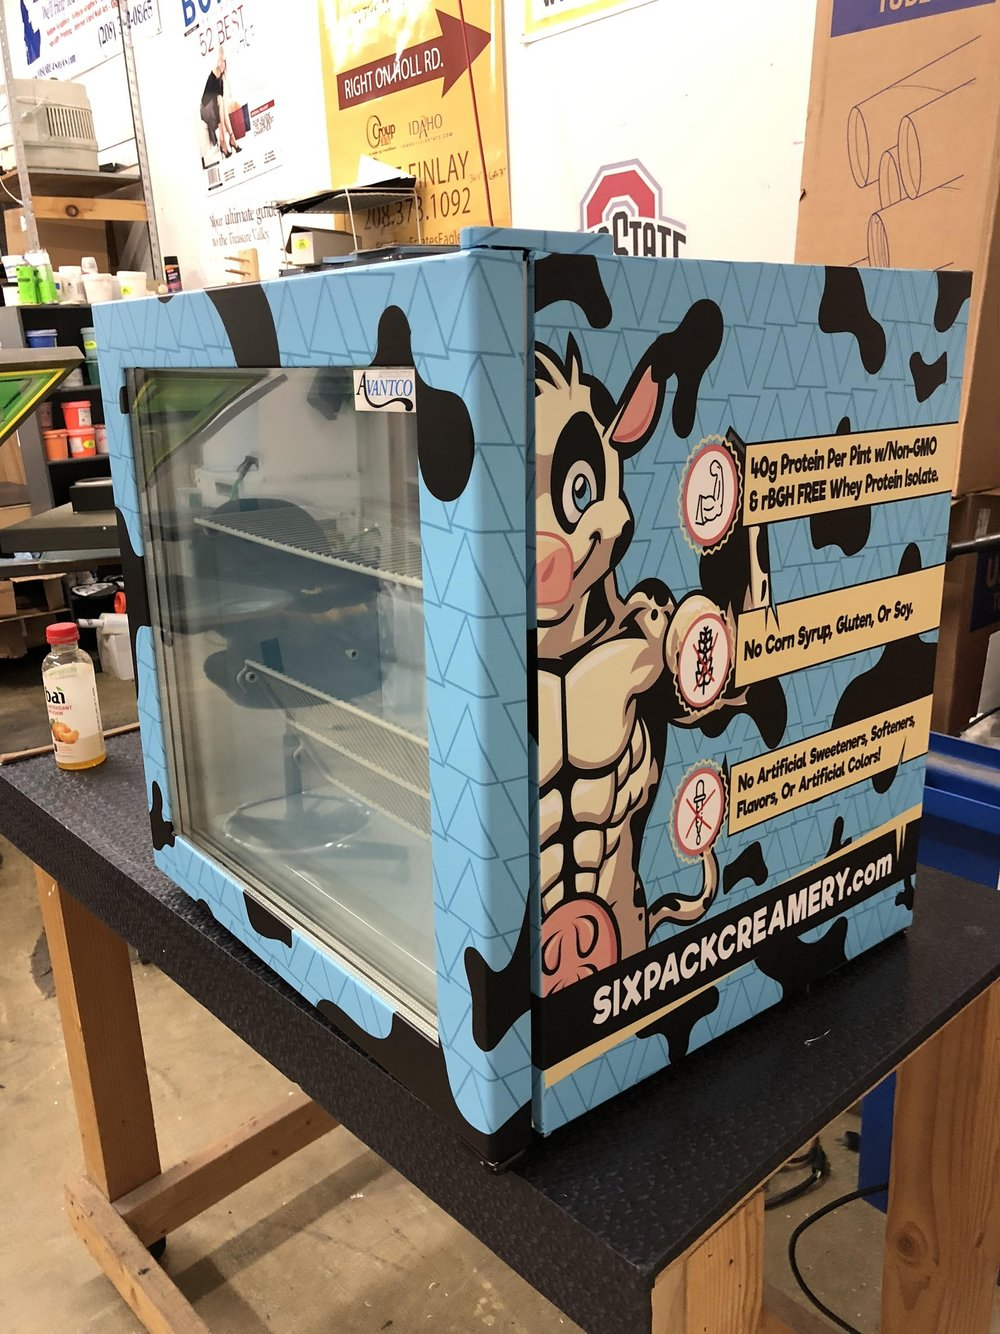 SIX PACK CREAMERY Freezer Wrap